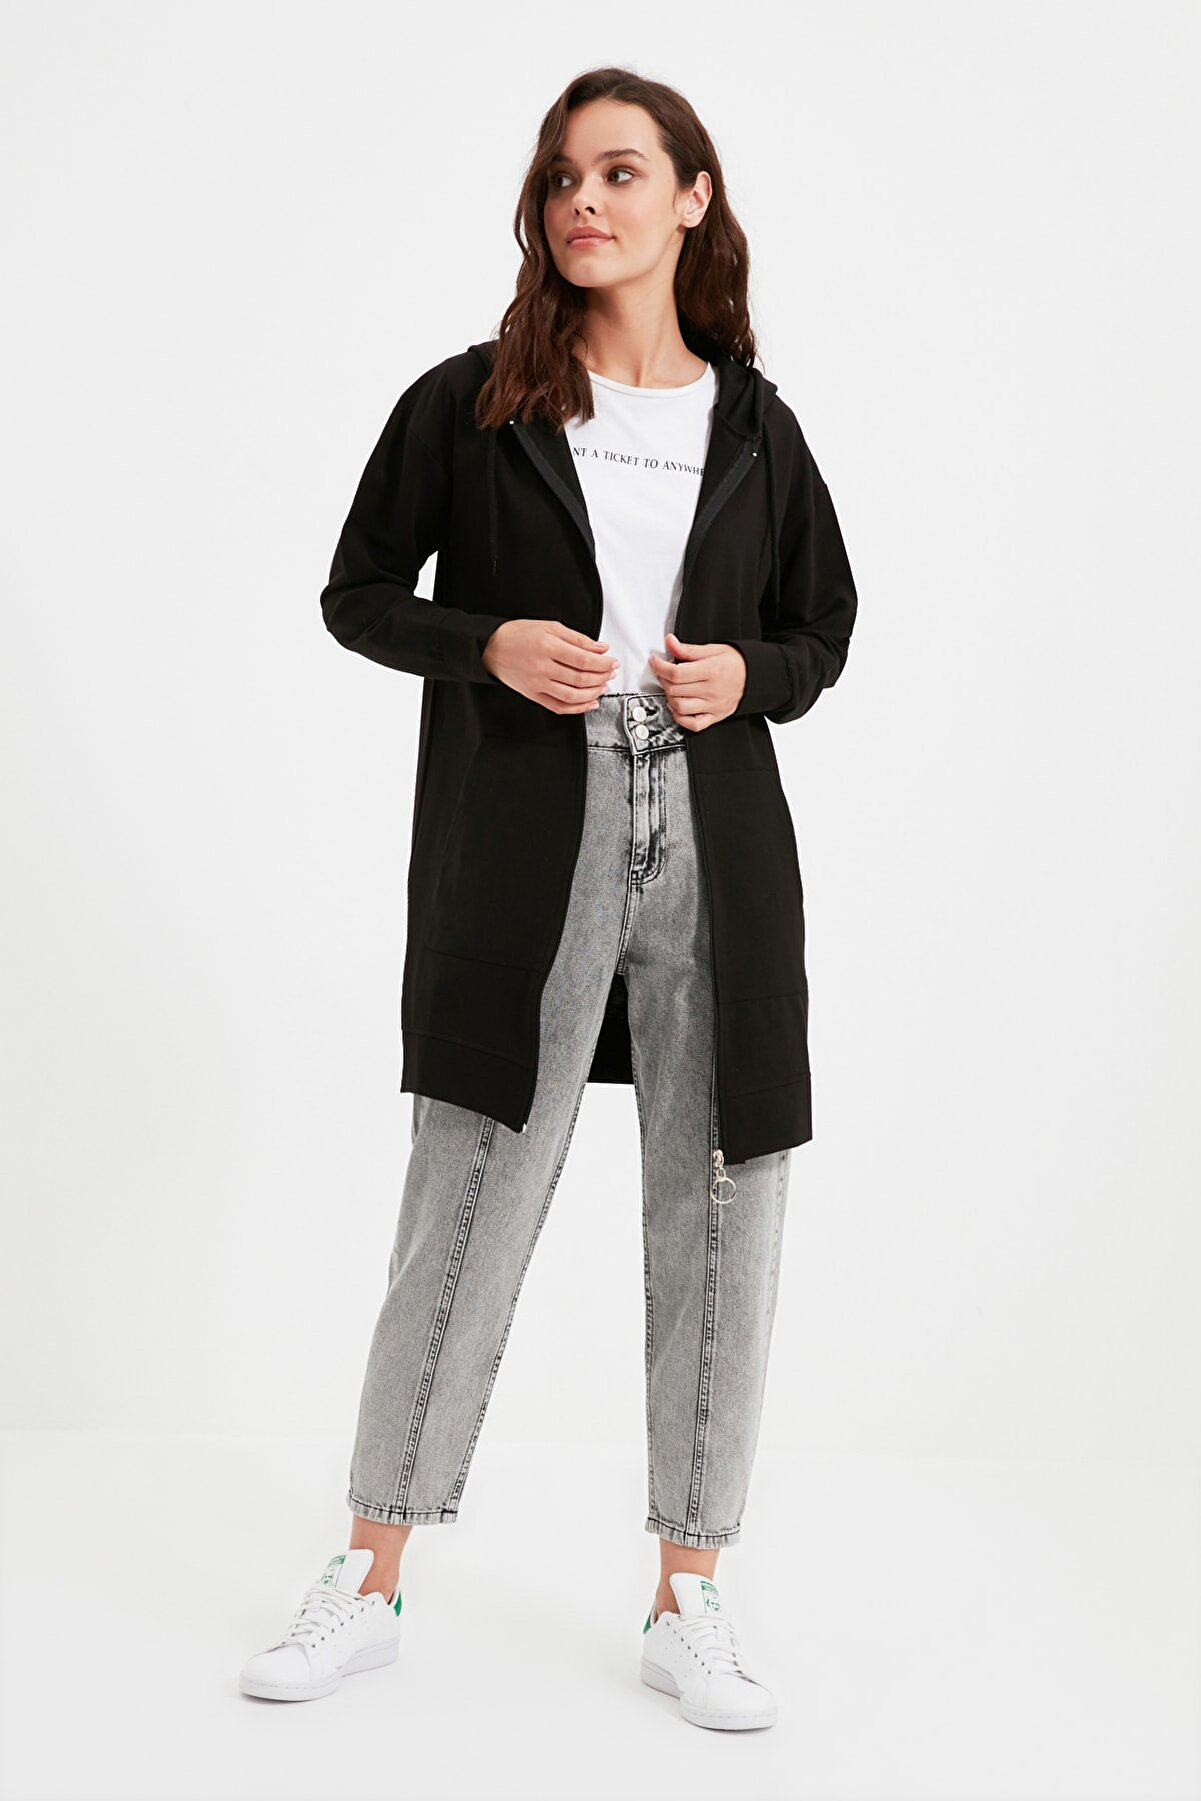 TRENDYOL MODEST Siyah Fermuarlı Kapüşonlu Basic Örme Sweatshirt TCTAW22TW0137